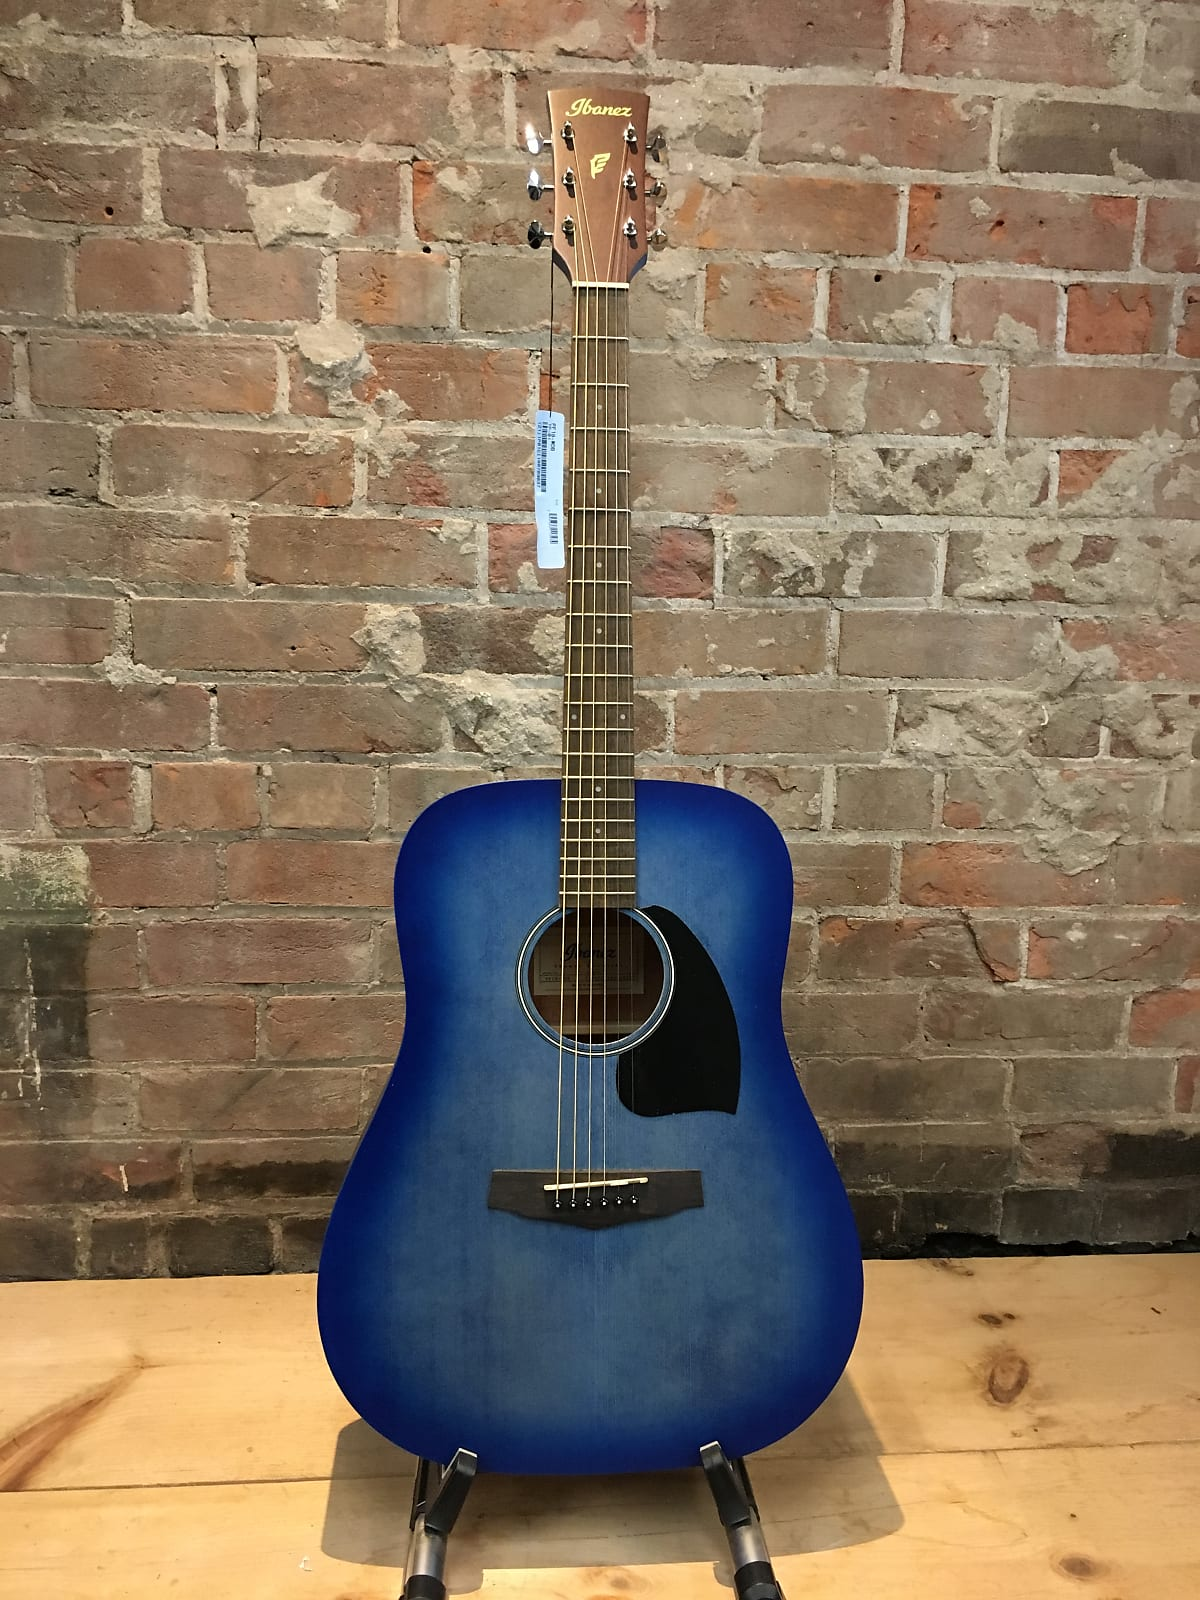 Ibanez PF18-WDB Acoustic Guitar Blue Denim